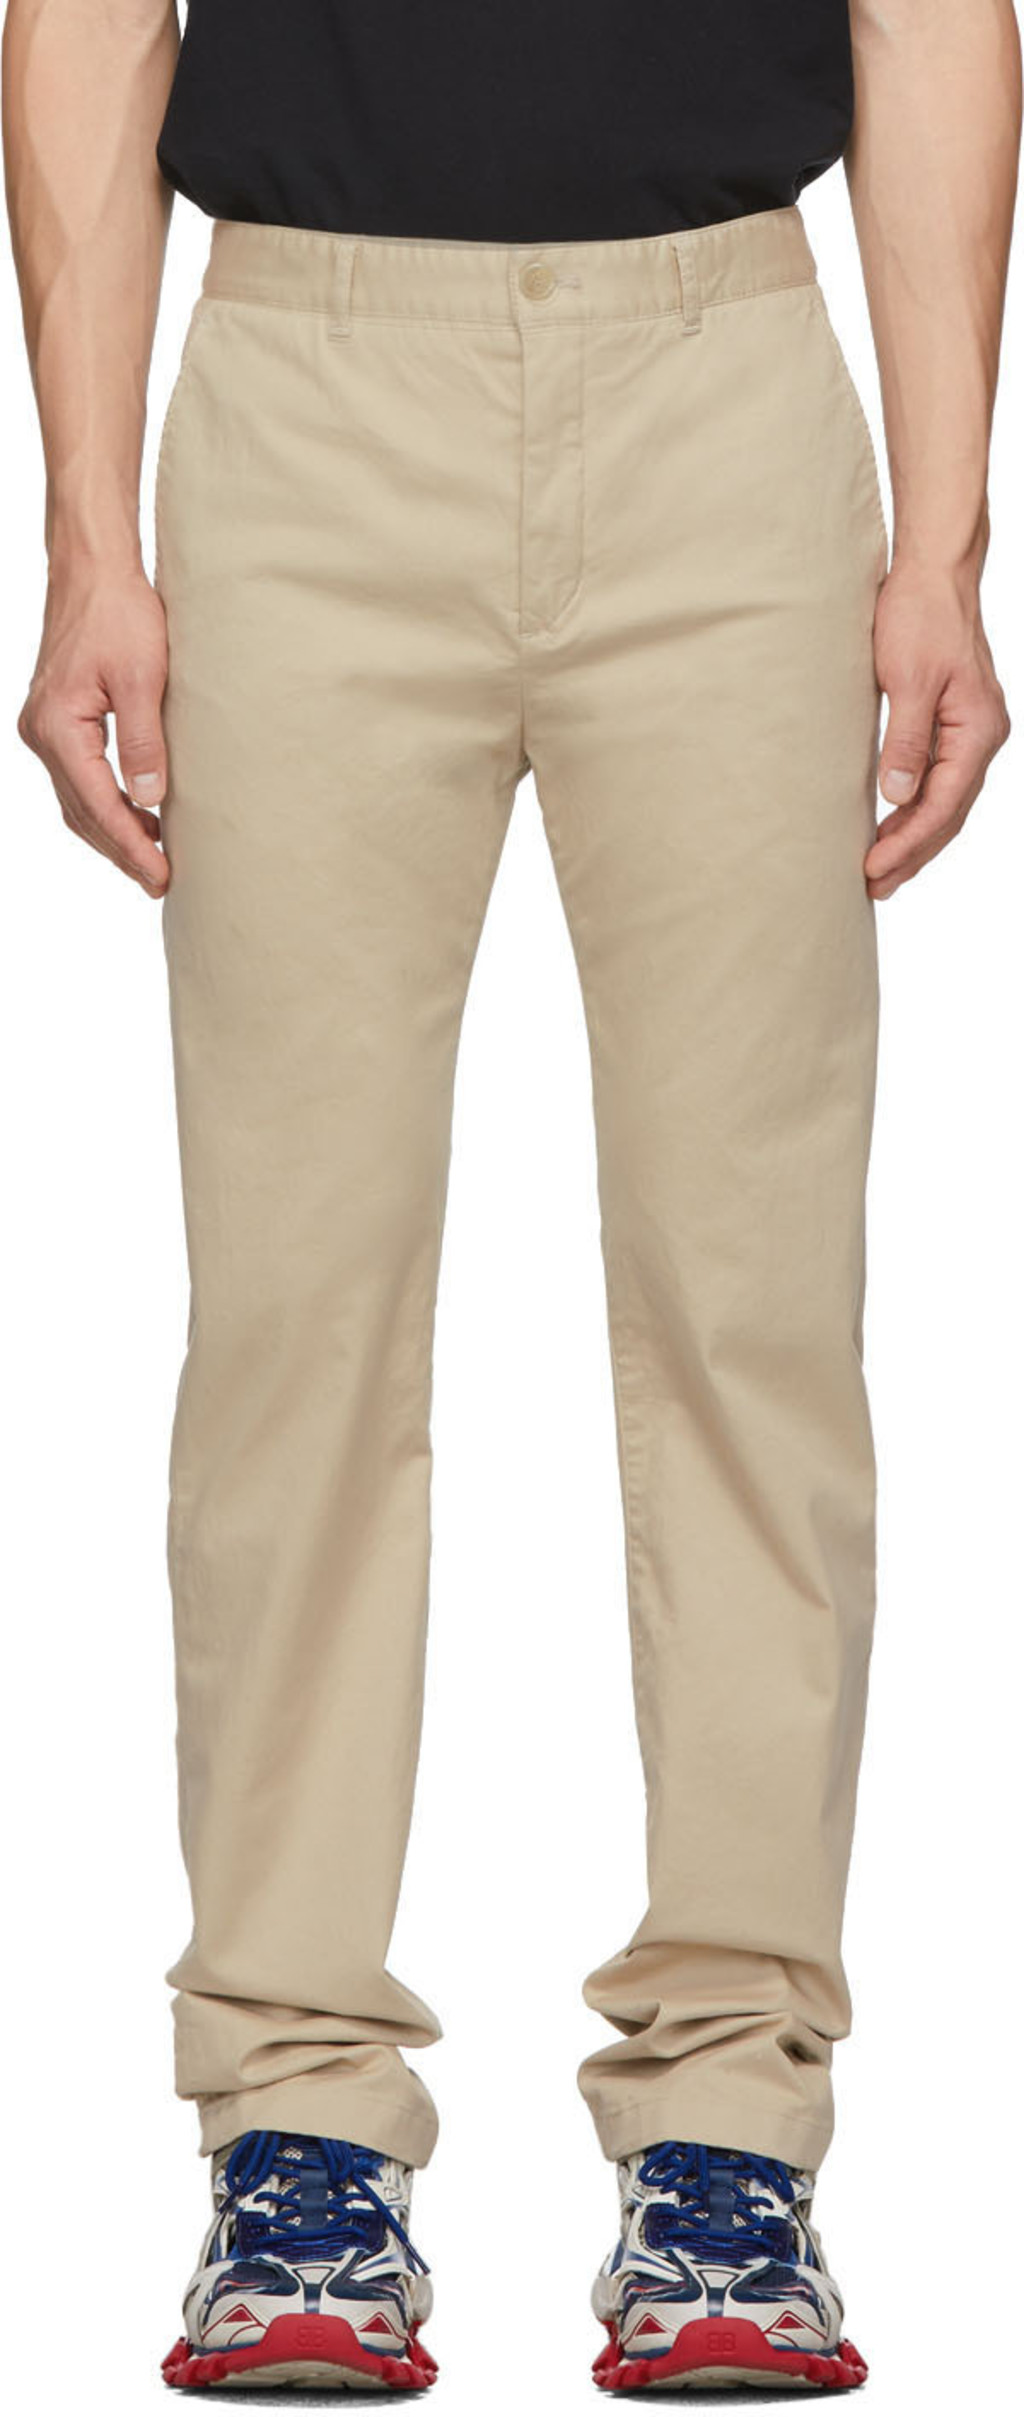 Cotton Cotton Beige Twill Beige Twill Trousers Trousers dCxoQeWrB